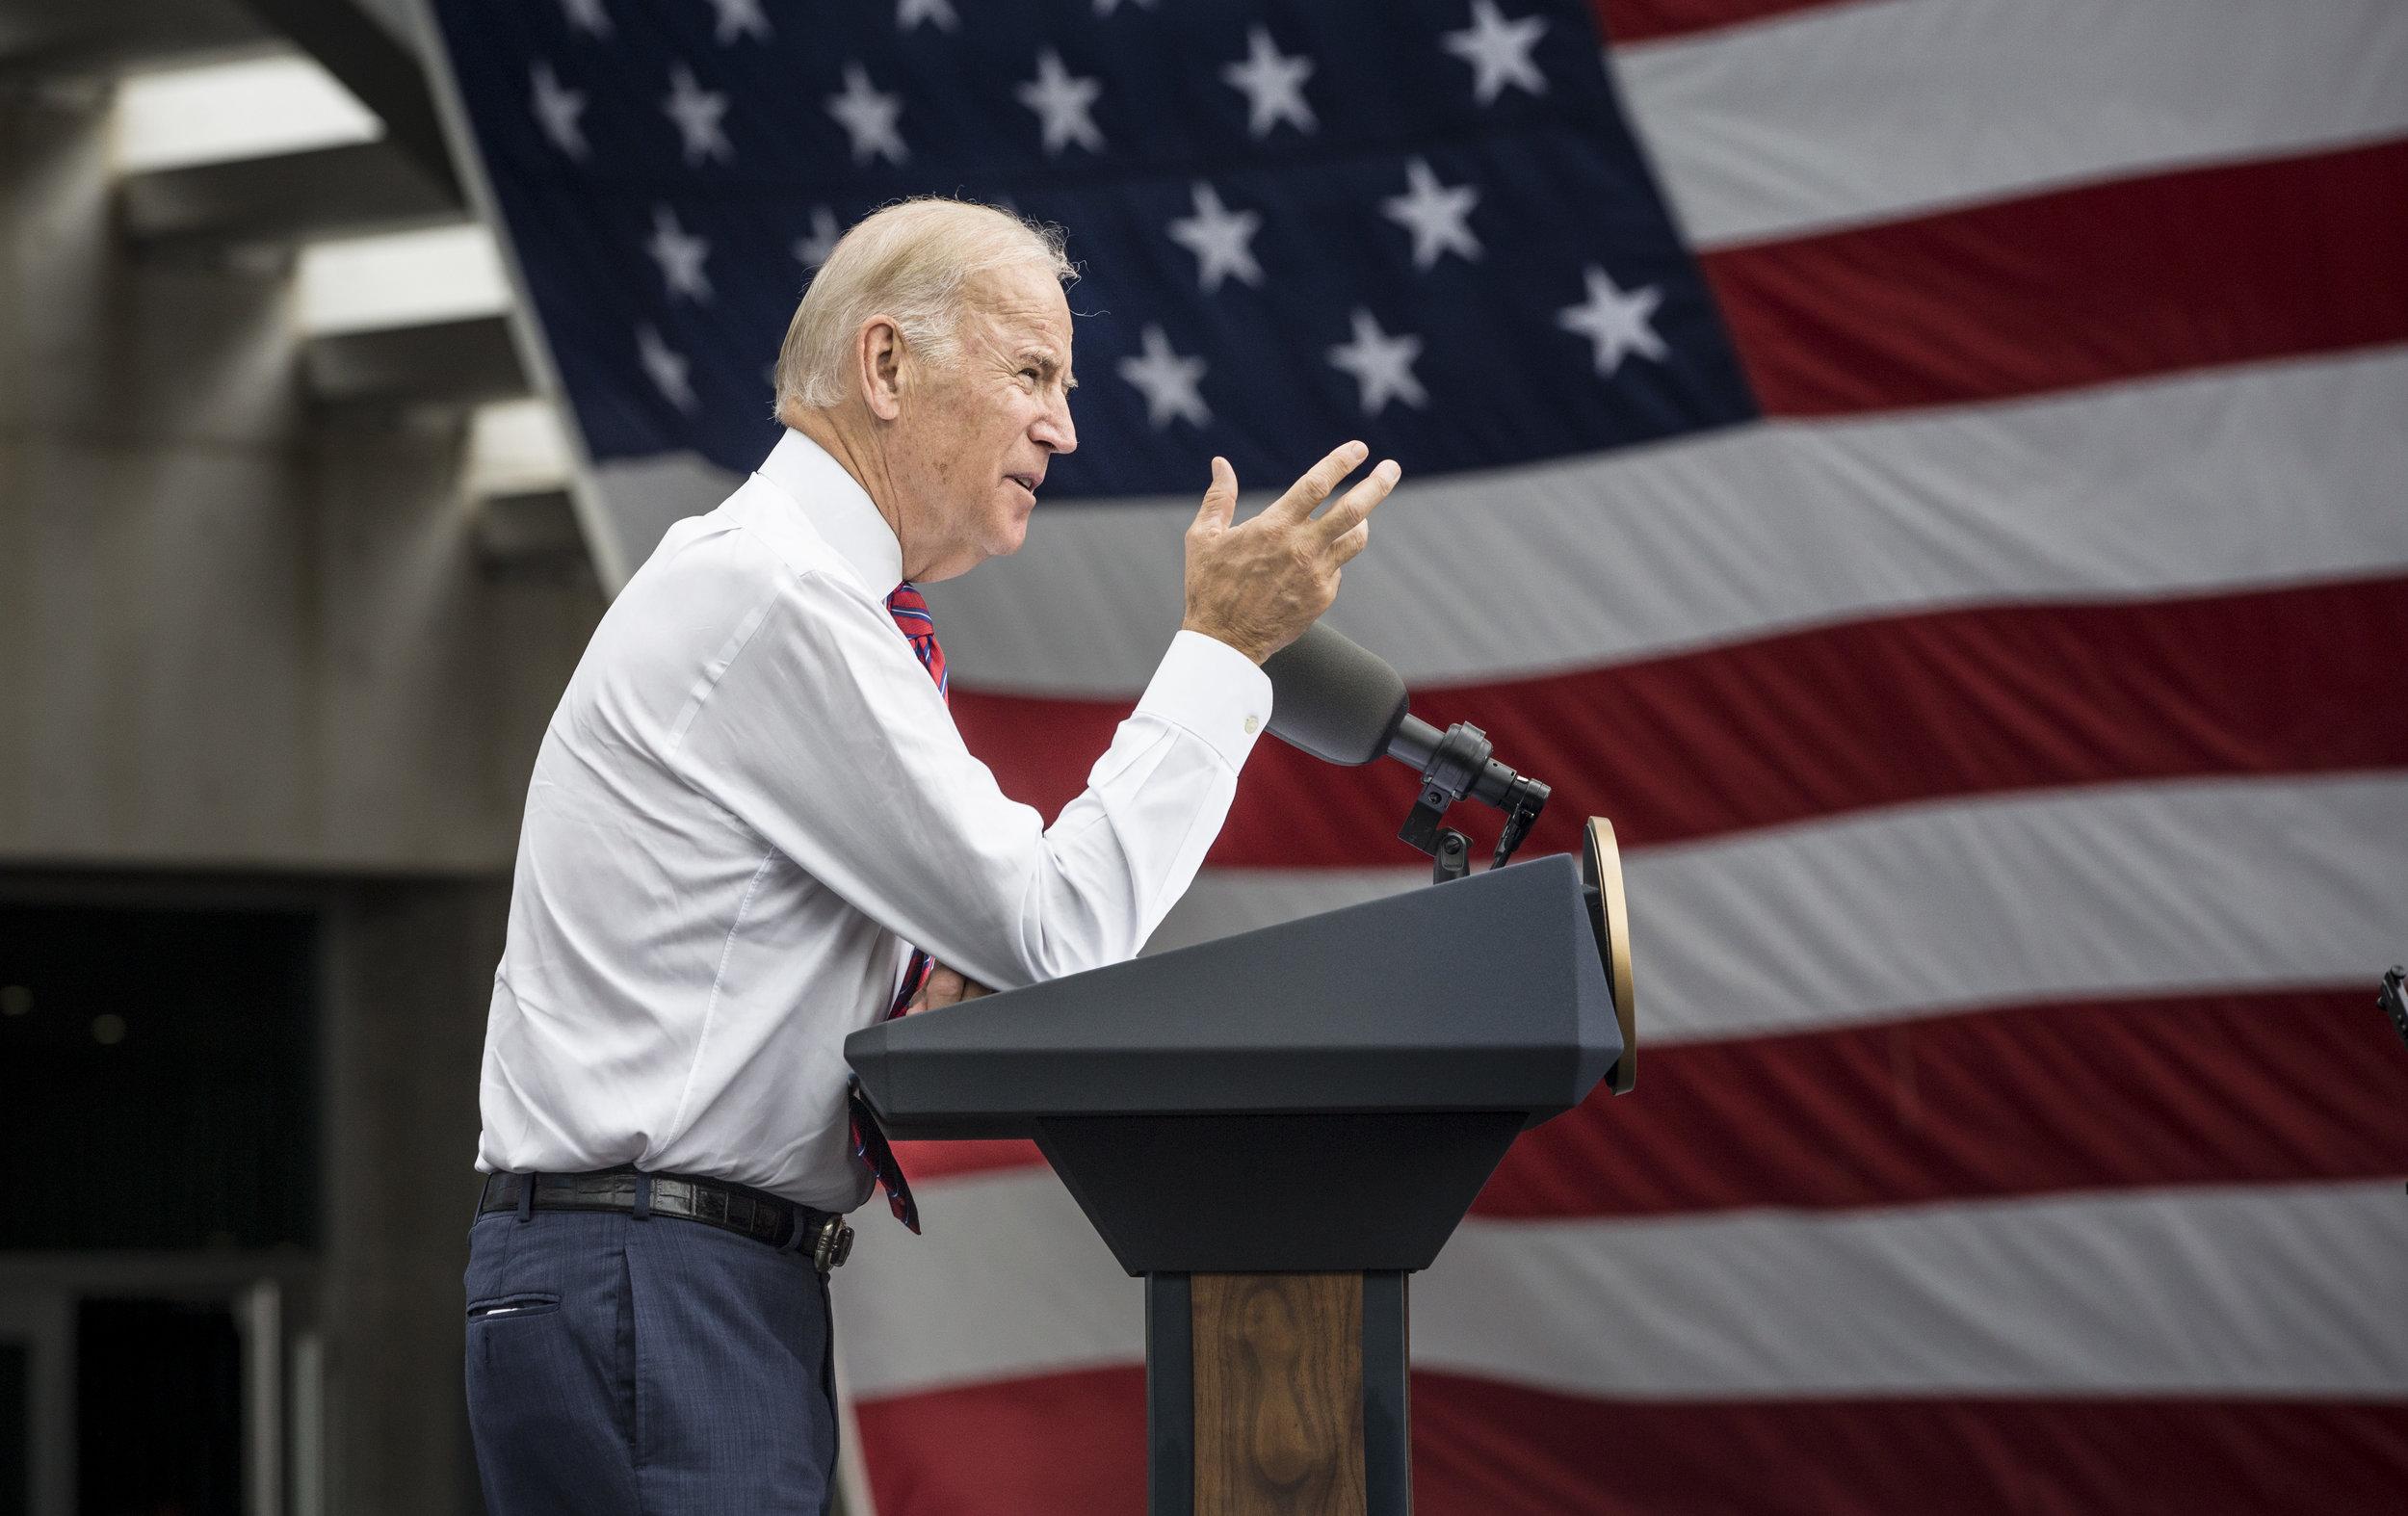 11022016_BJM_VP_Joe_Biden_Rally_in_Tampa_Florida_02.jpg